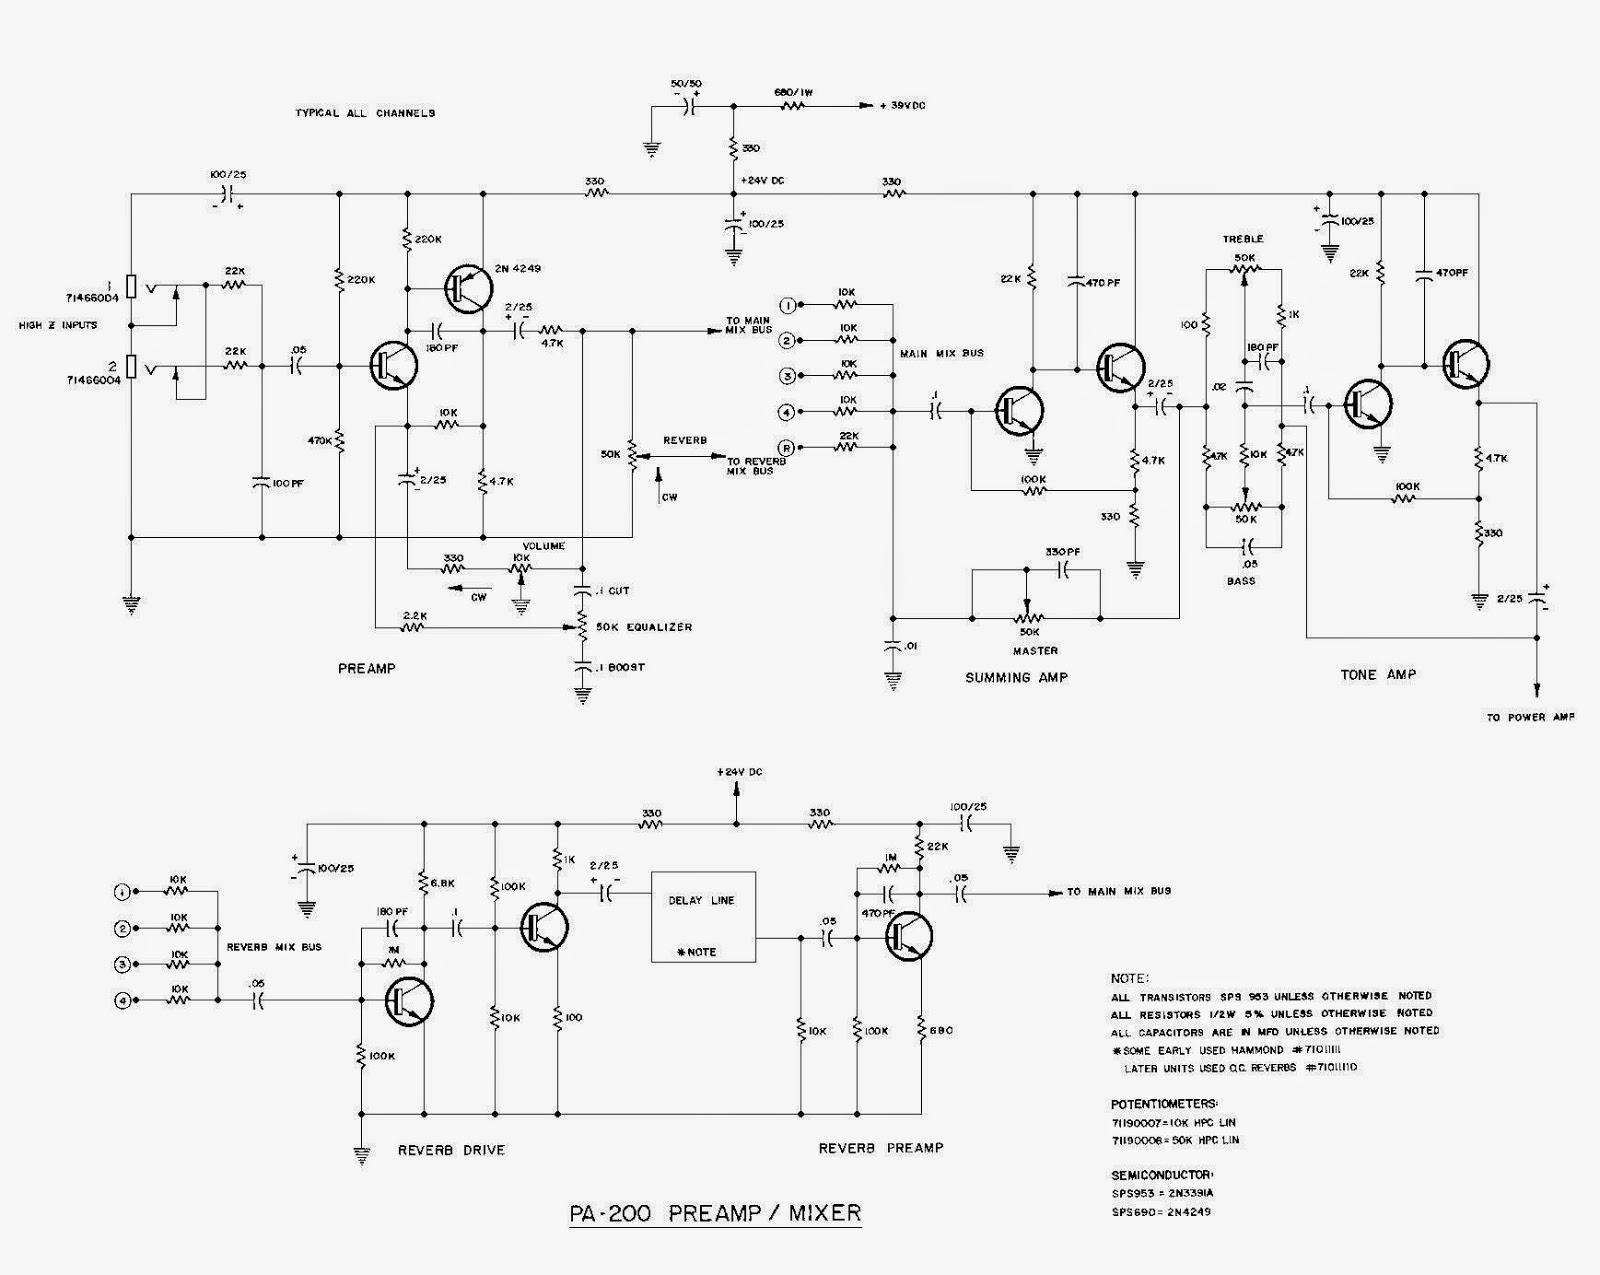 100+ Peavey Schematics Service Manuals 680s – yasminroohi